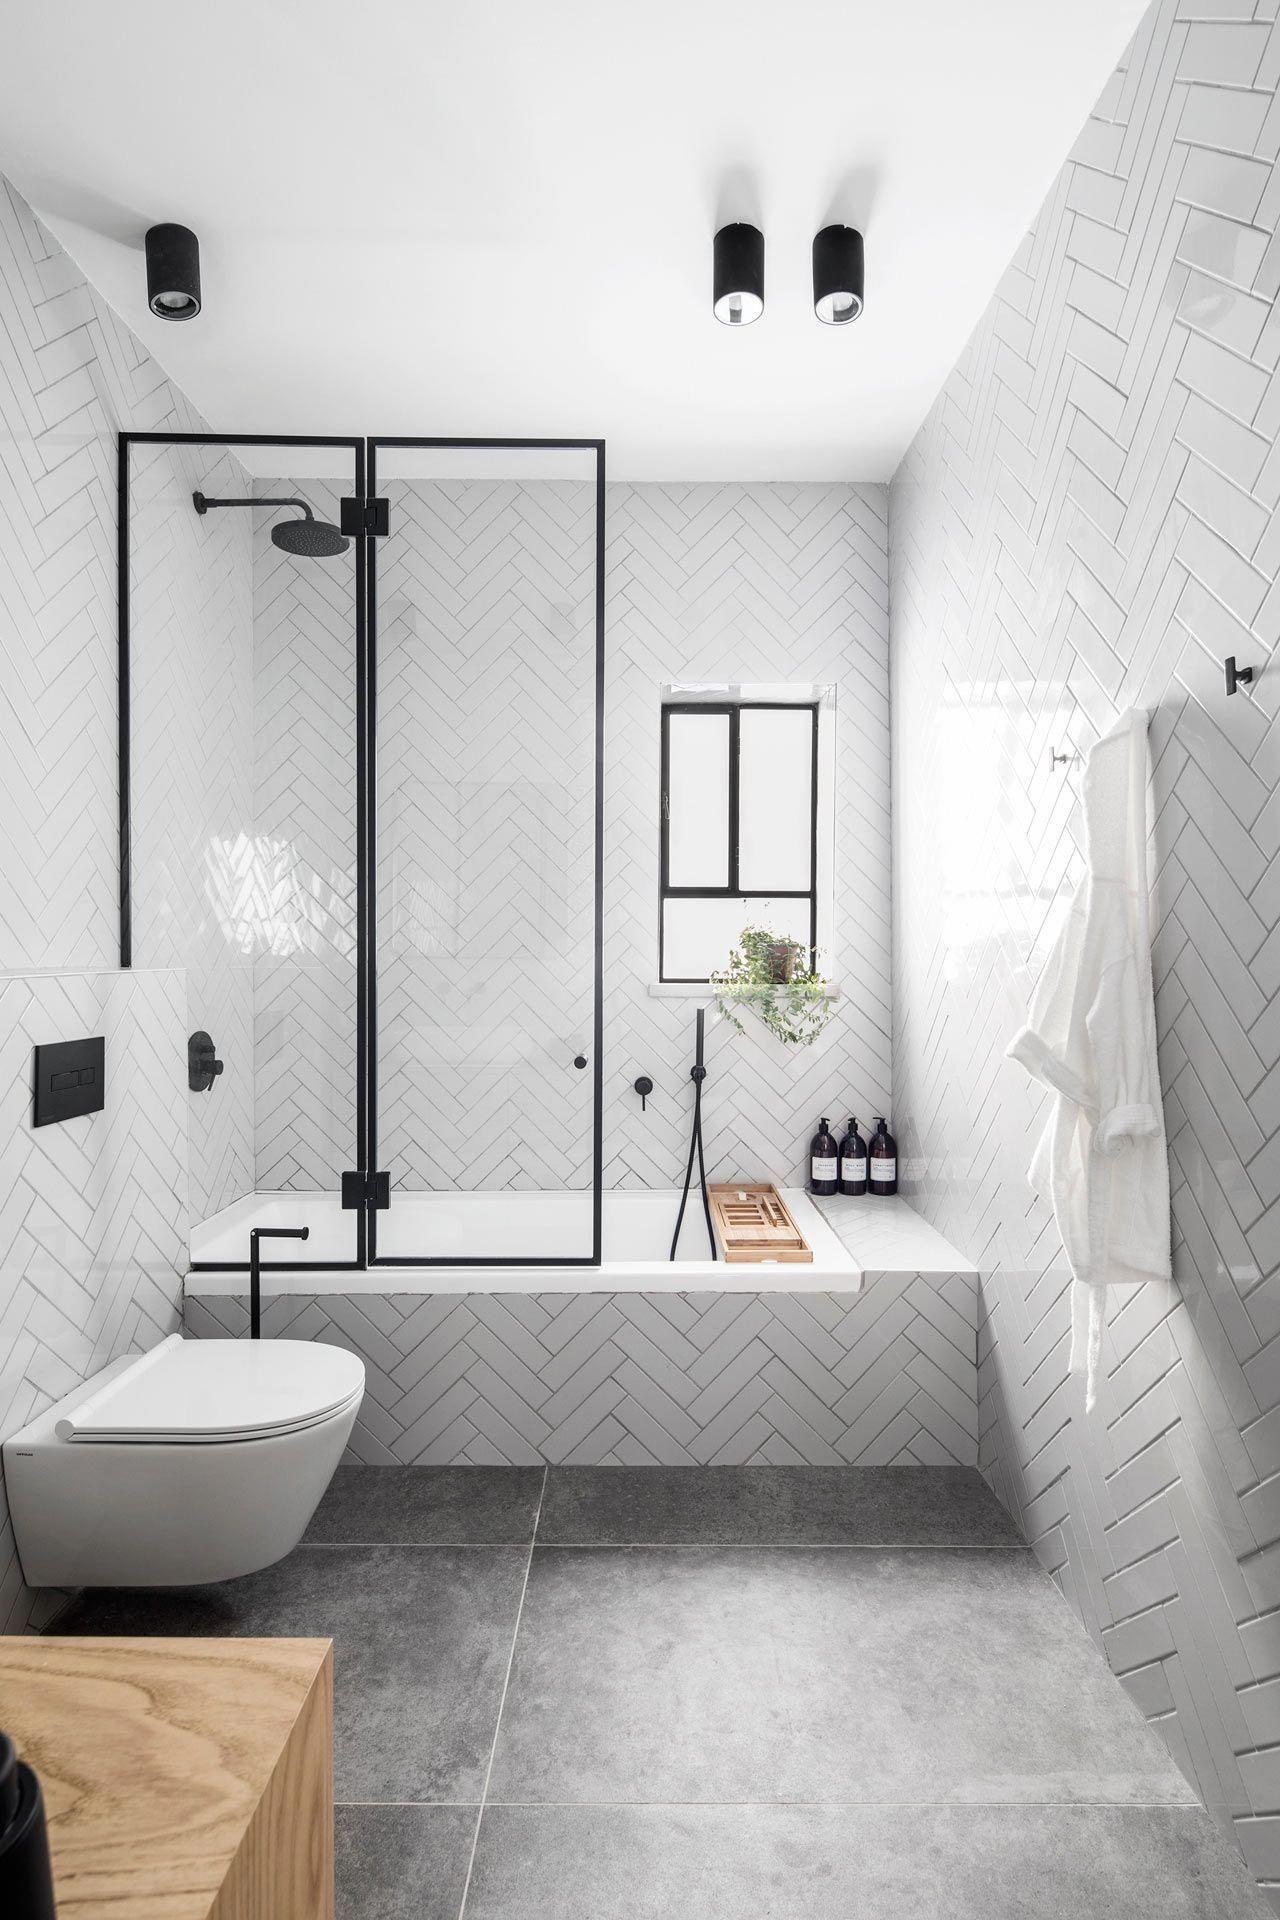 Bathroomideas Modern Bathroom Bathroom Interior Design Modern Bathroom Design